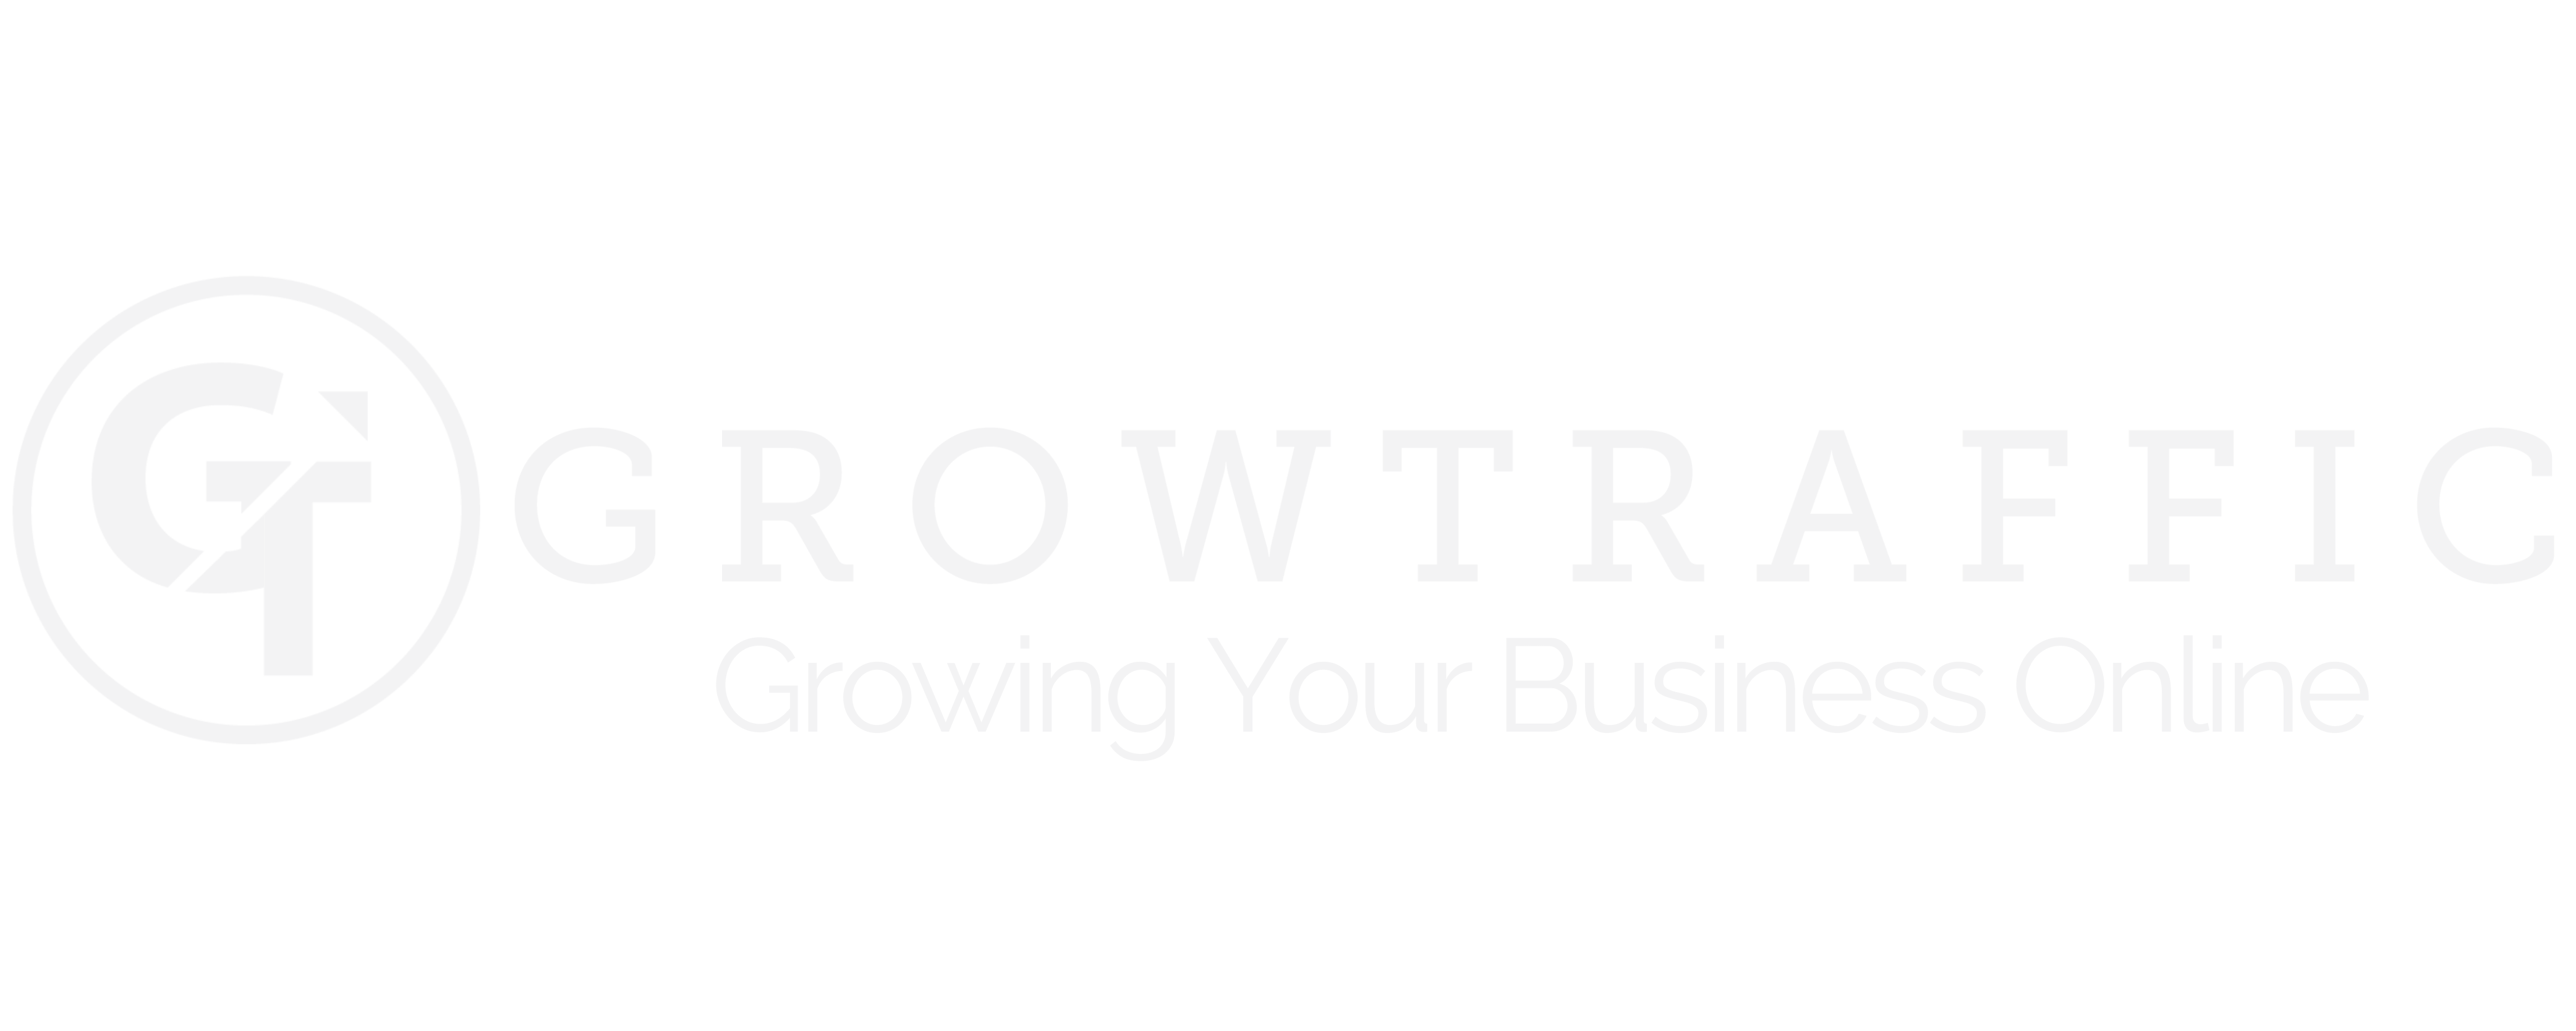 GorwTraffic Logo - Growing Your Business Online